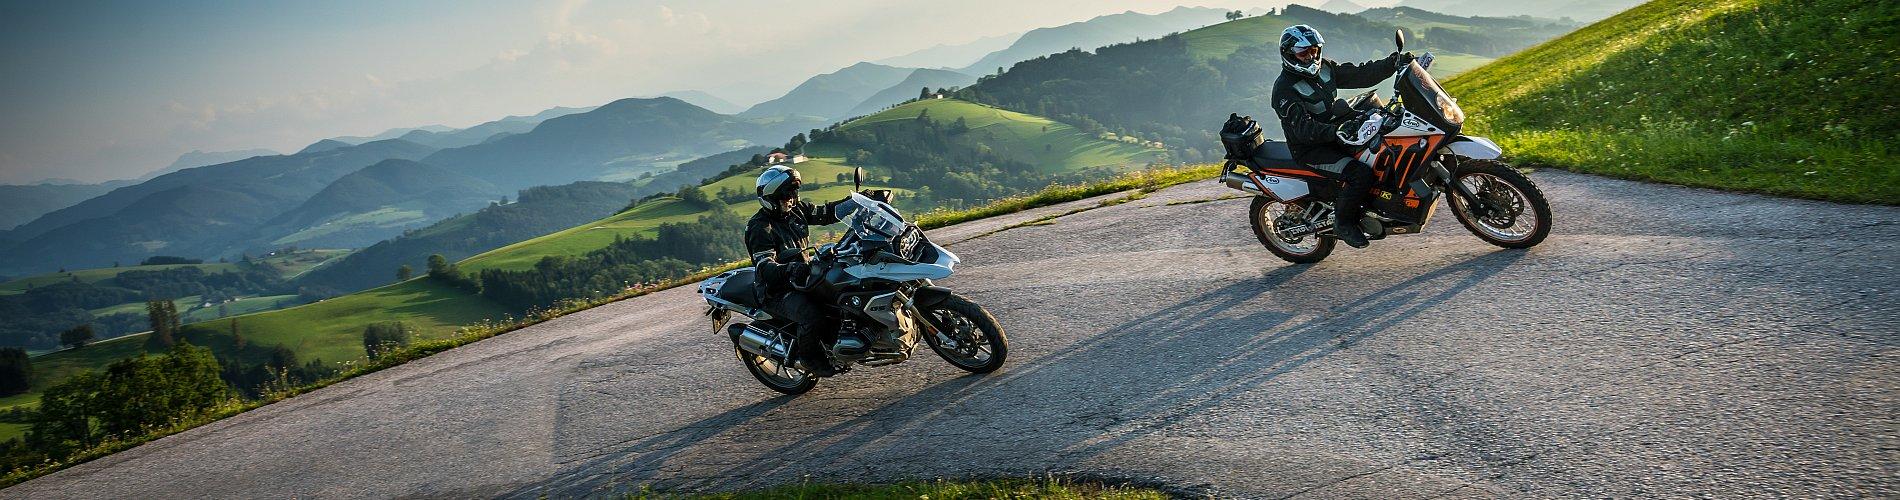 Bmw motorrad klapphelme test